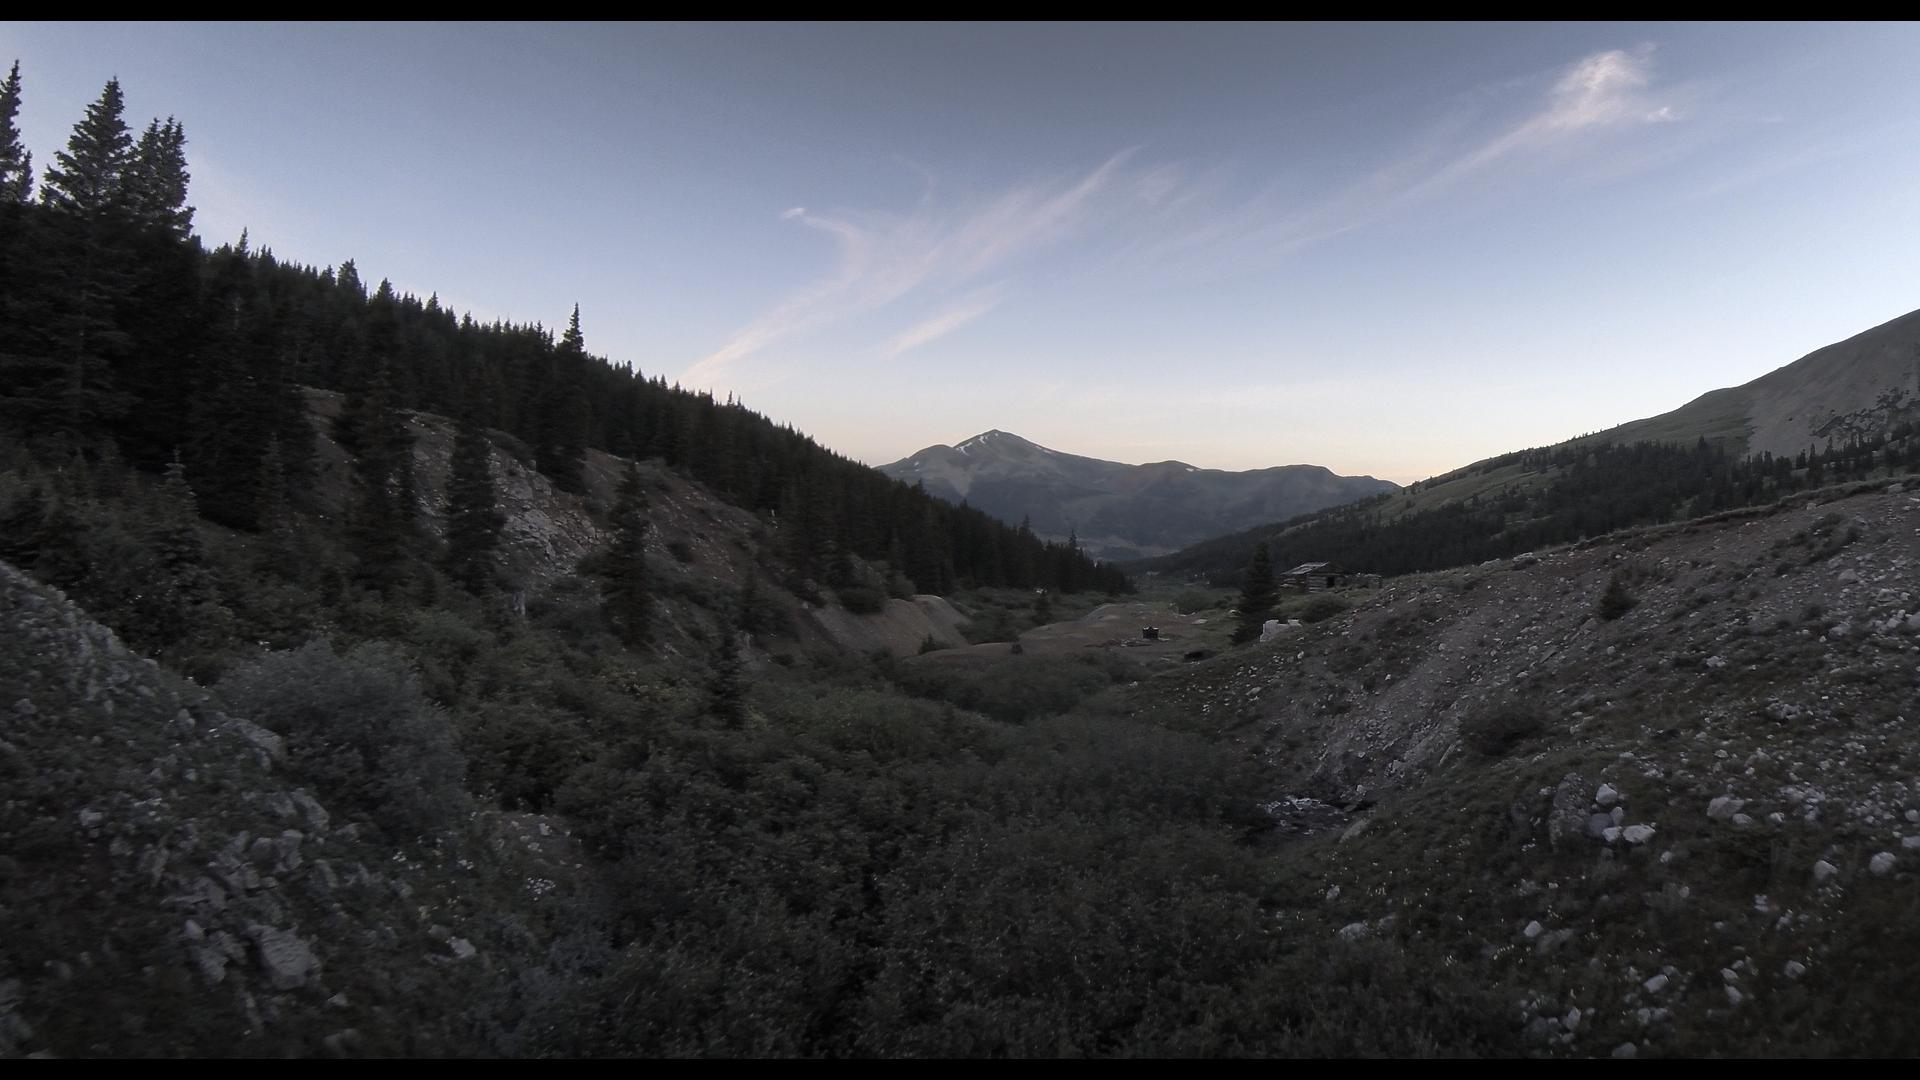 DroneCLR_1.21.2.jpg